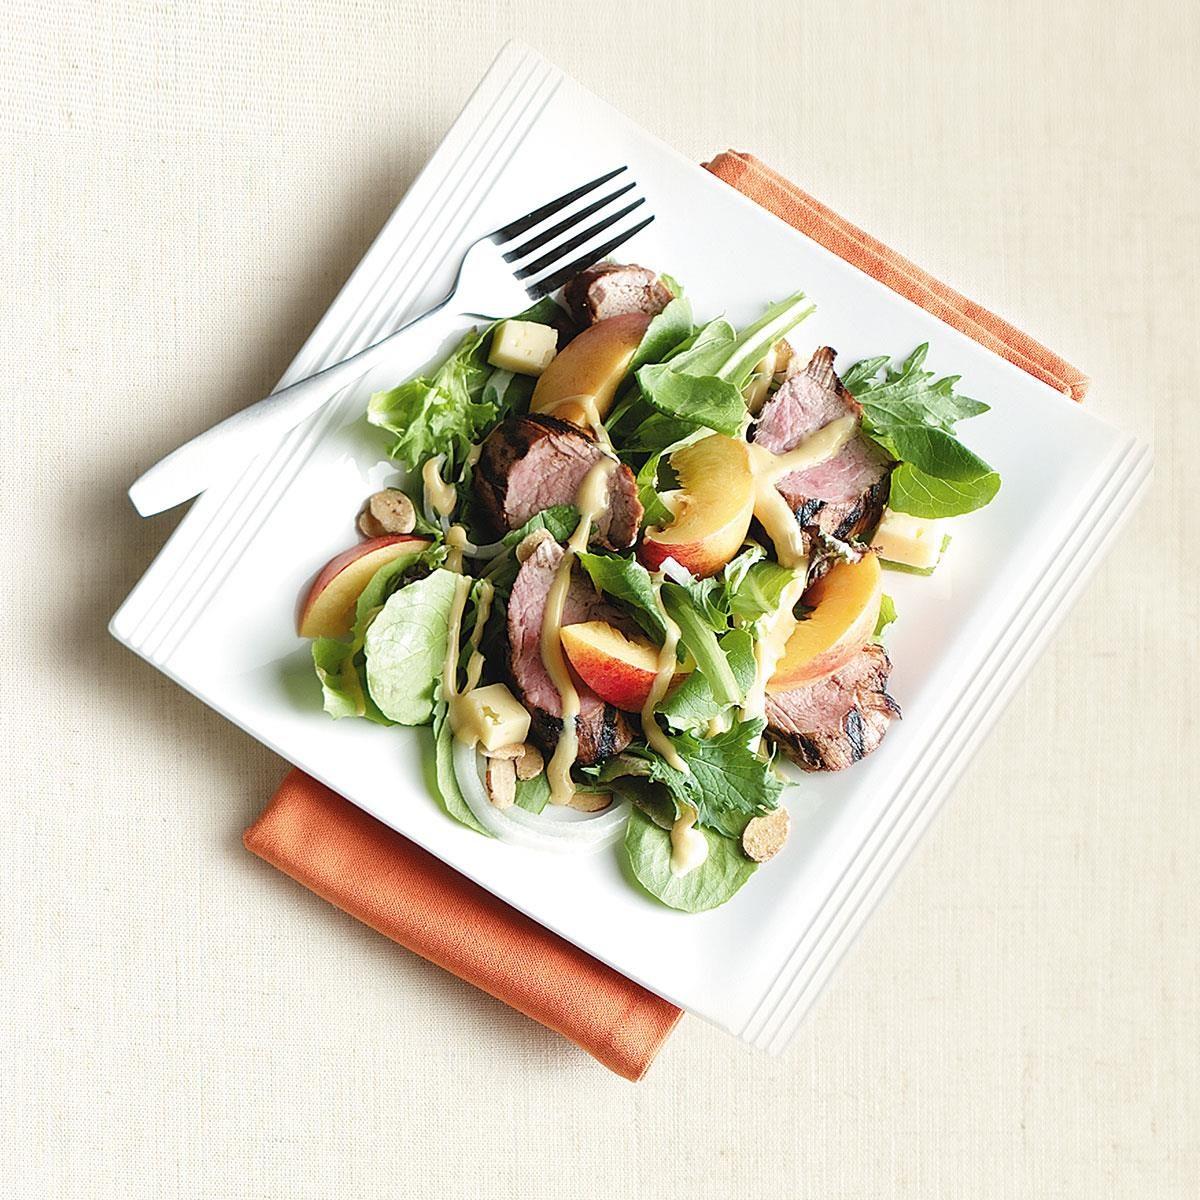 Pork Tenderloin Recipes: Pork Tenderloin Nectarine Salad Recipe